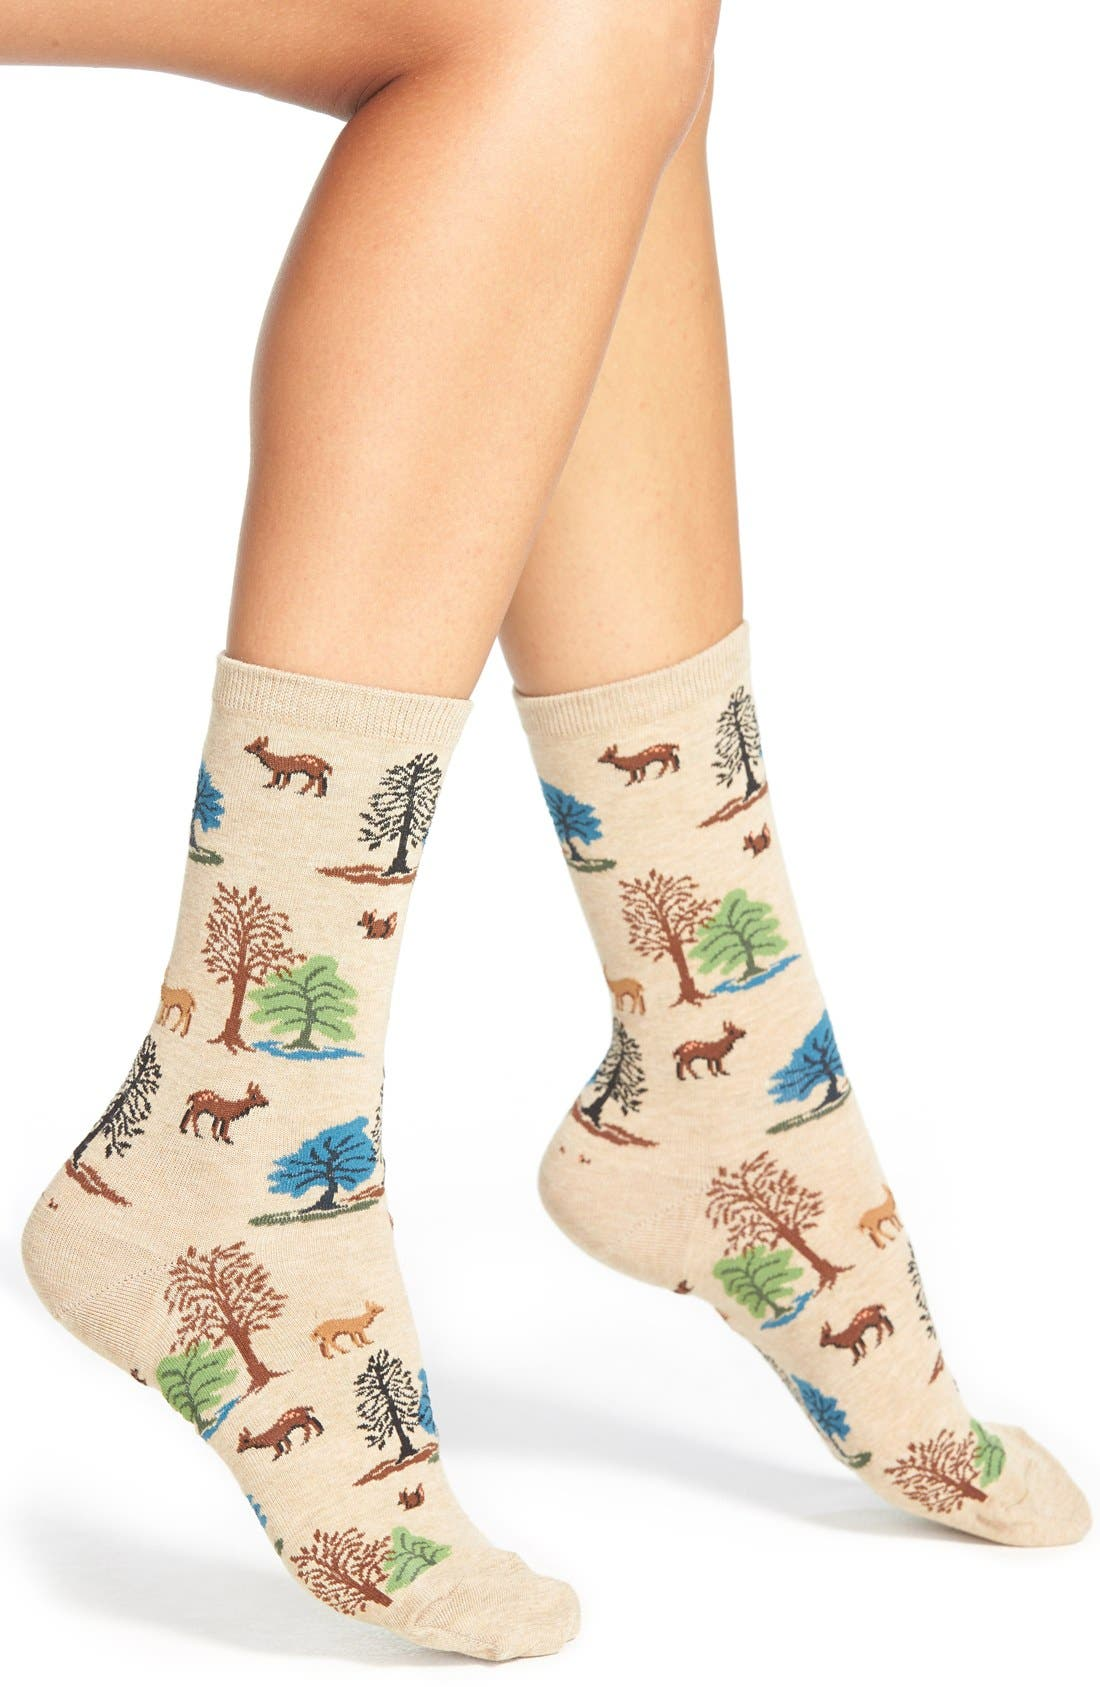 Main Image - Hot Sox 'Deer Scene' Crew Socks (3 for $15)